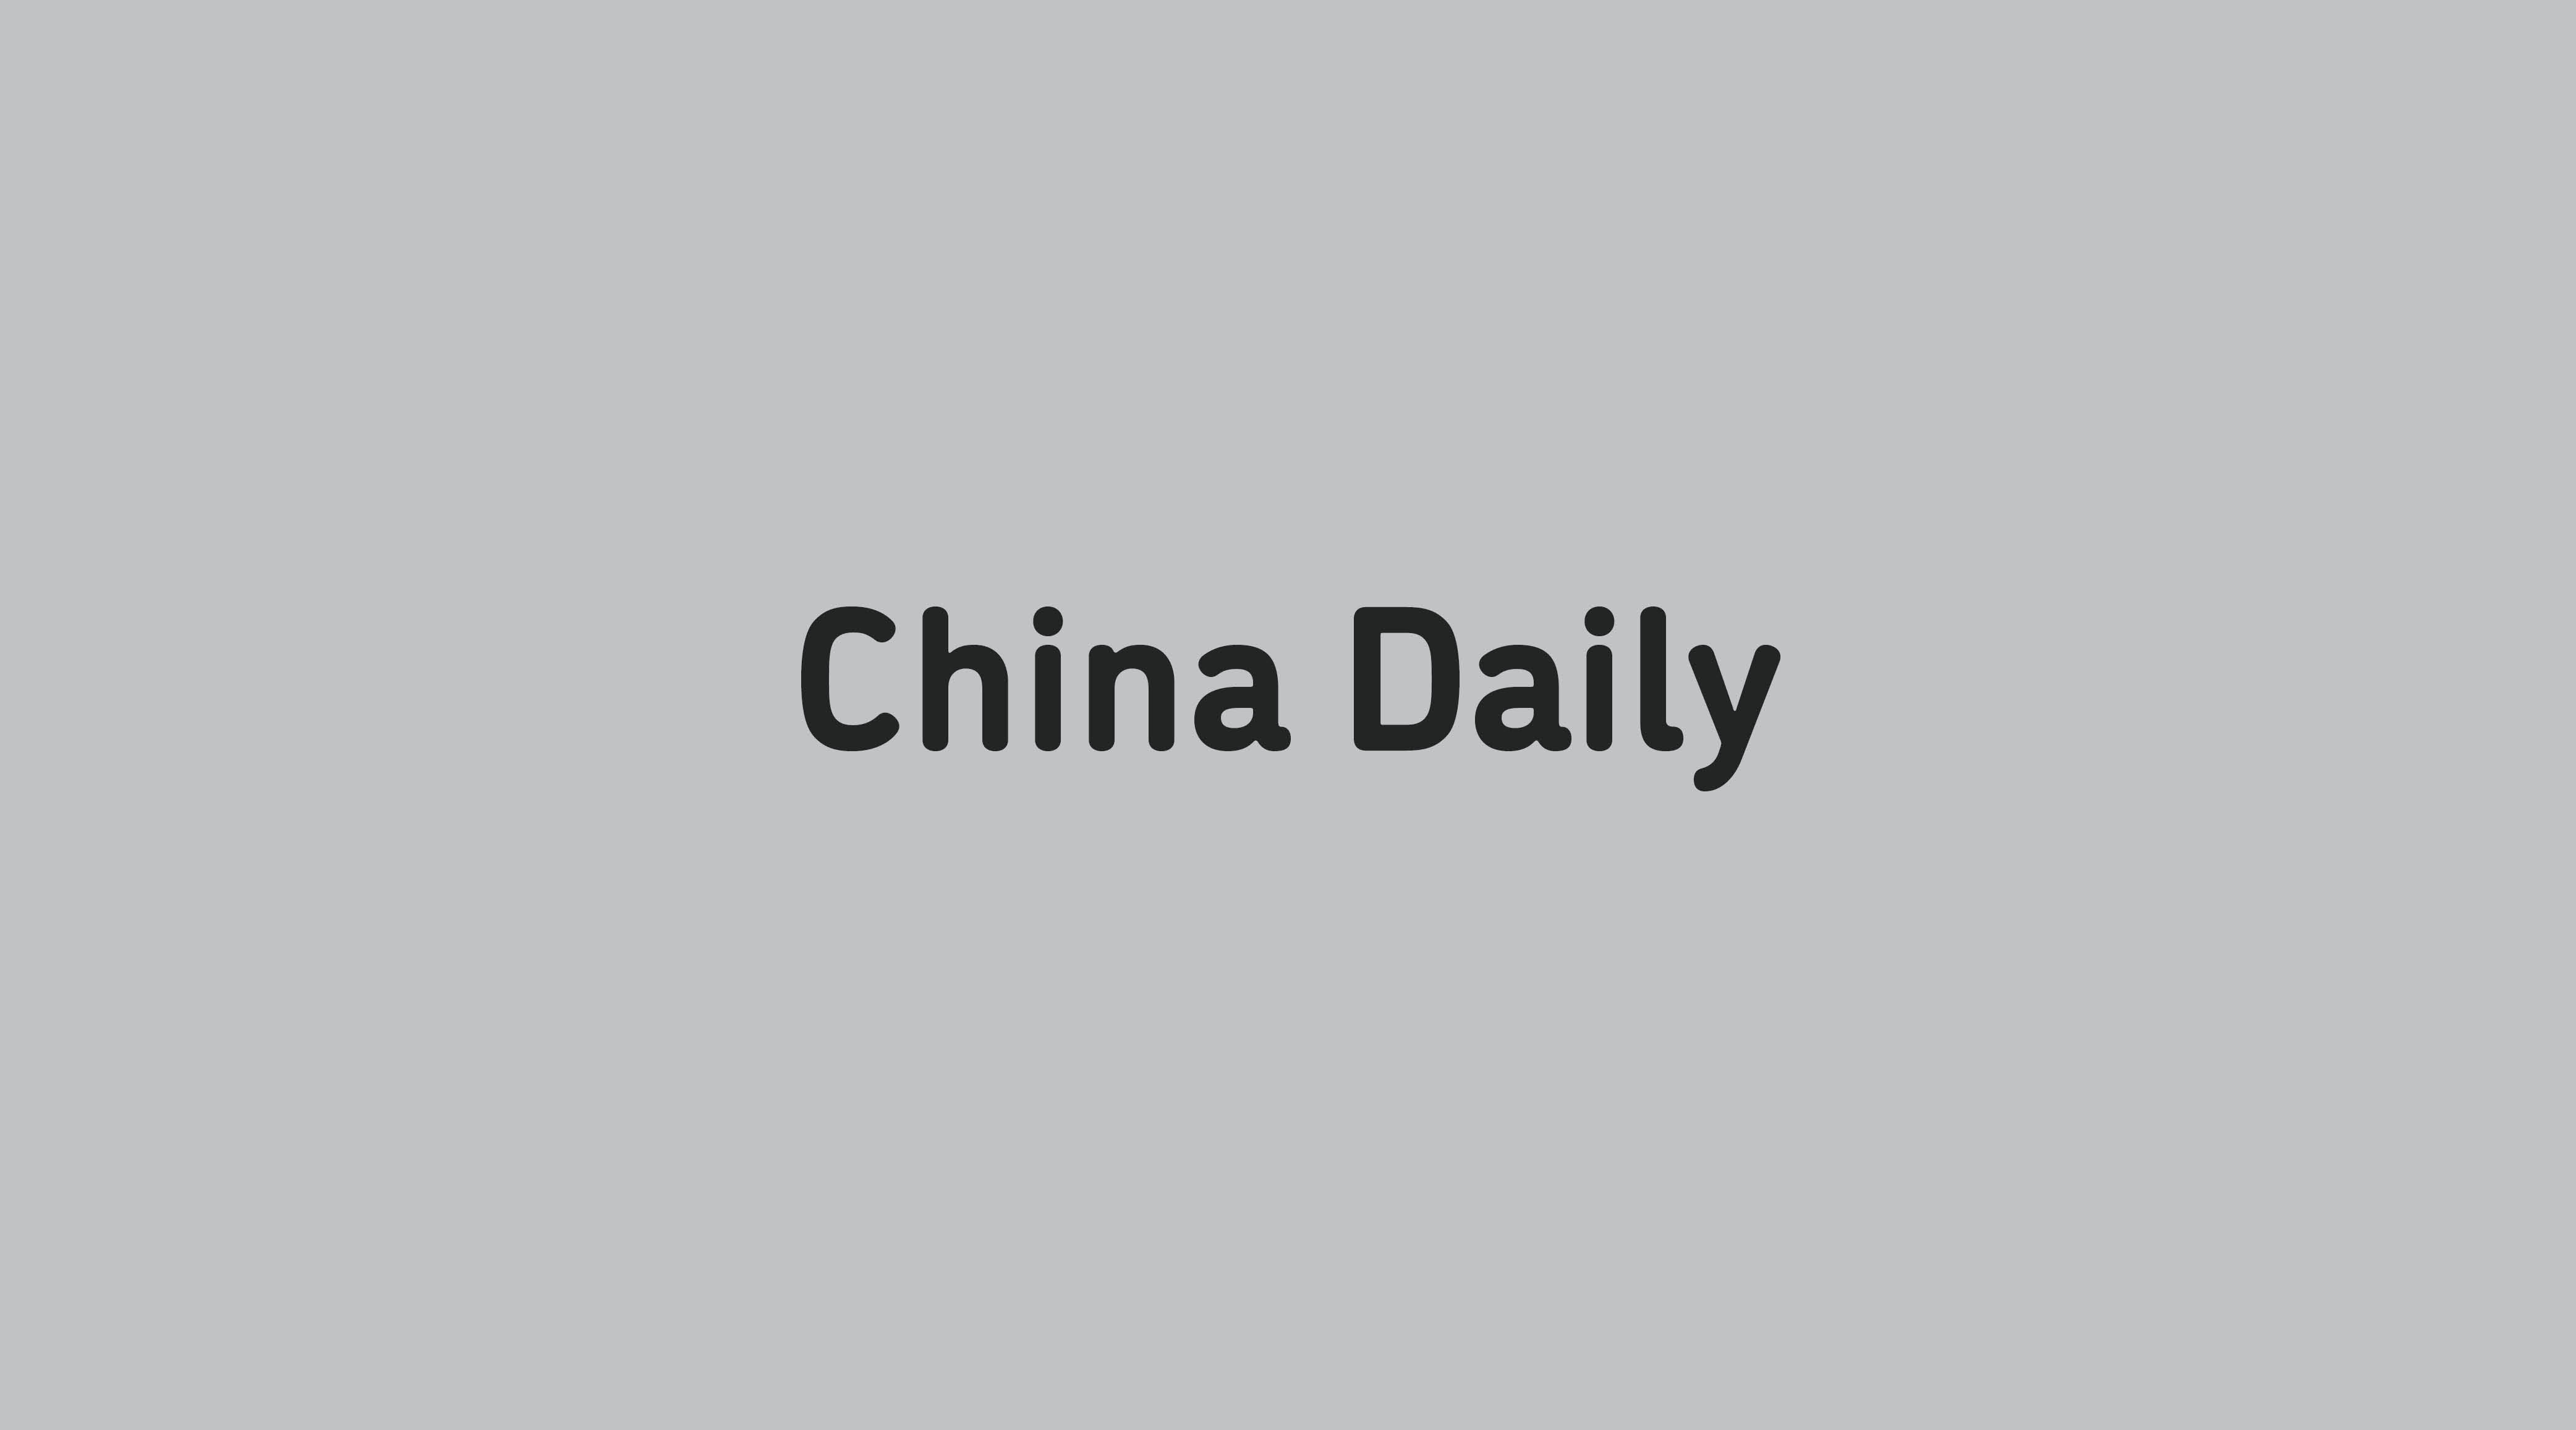 News 4 China Daily